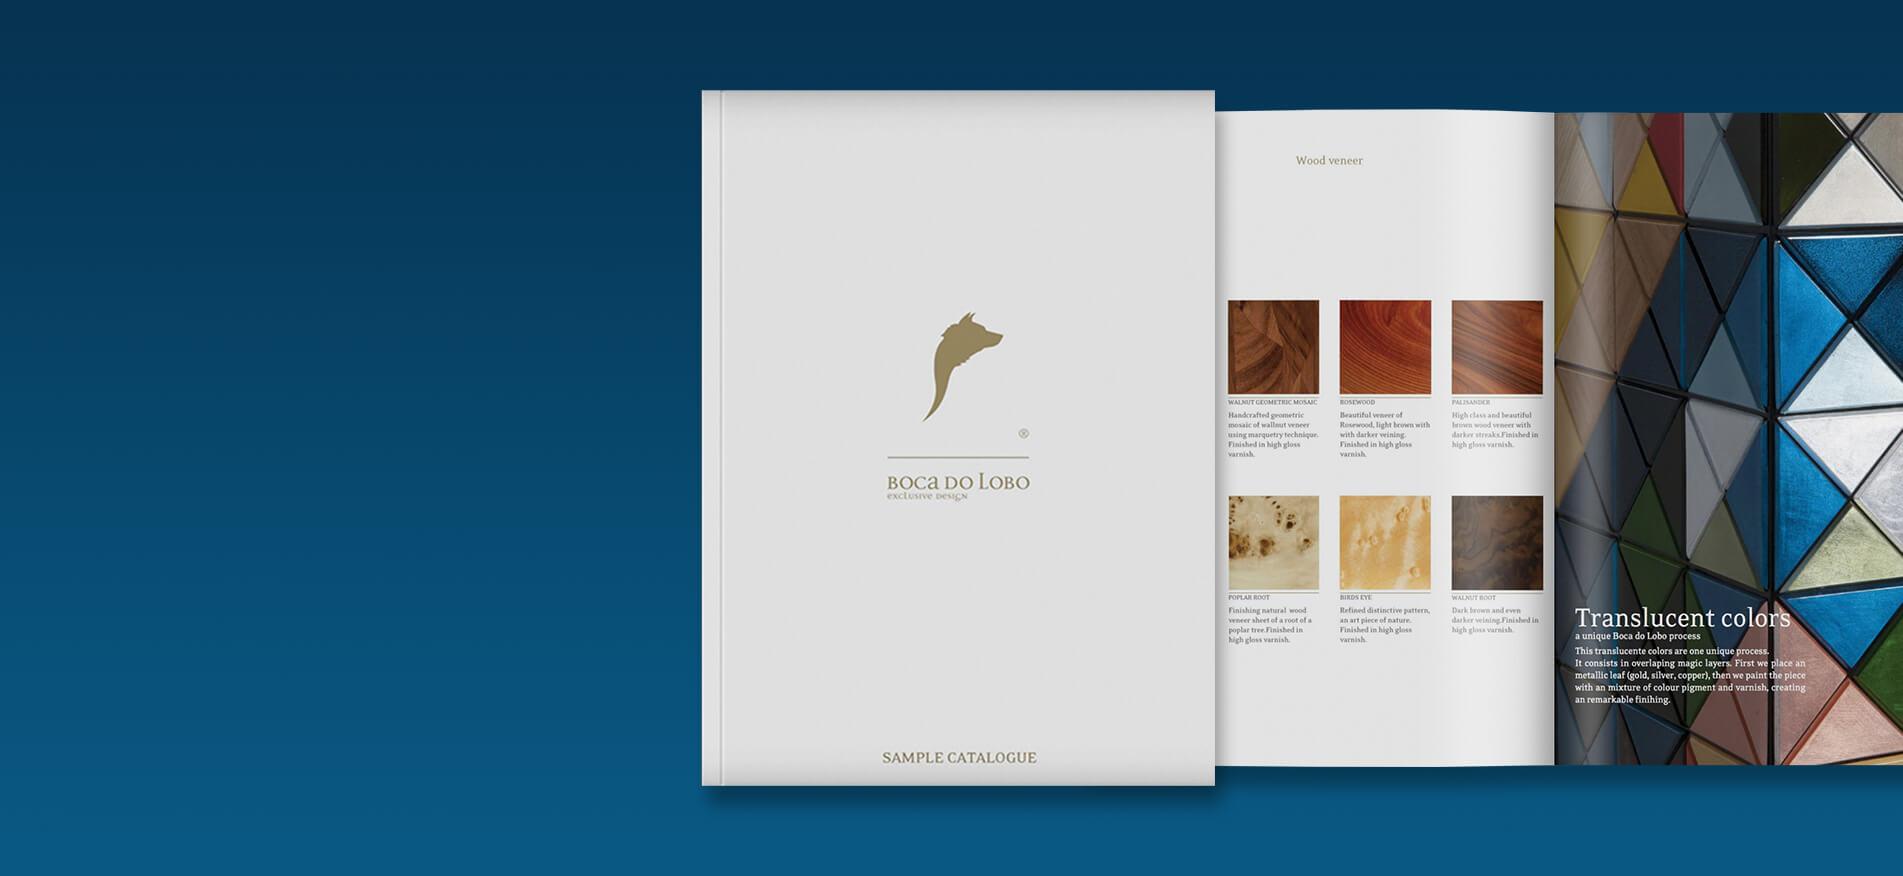 Catalogues Page Boca Do Lobo